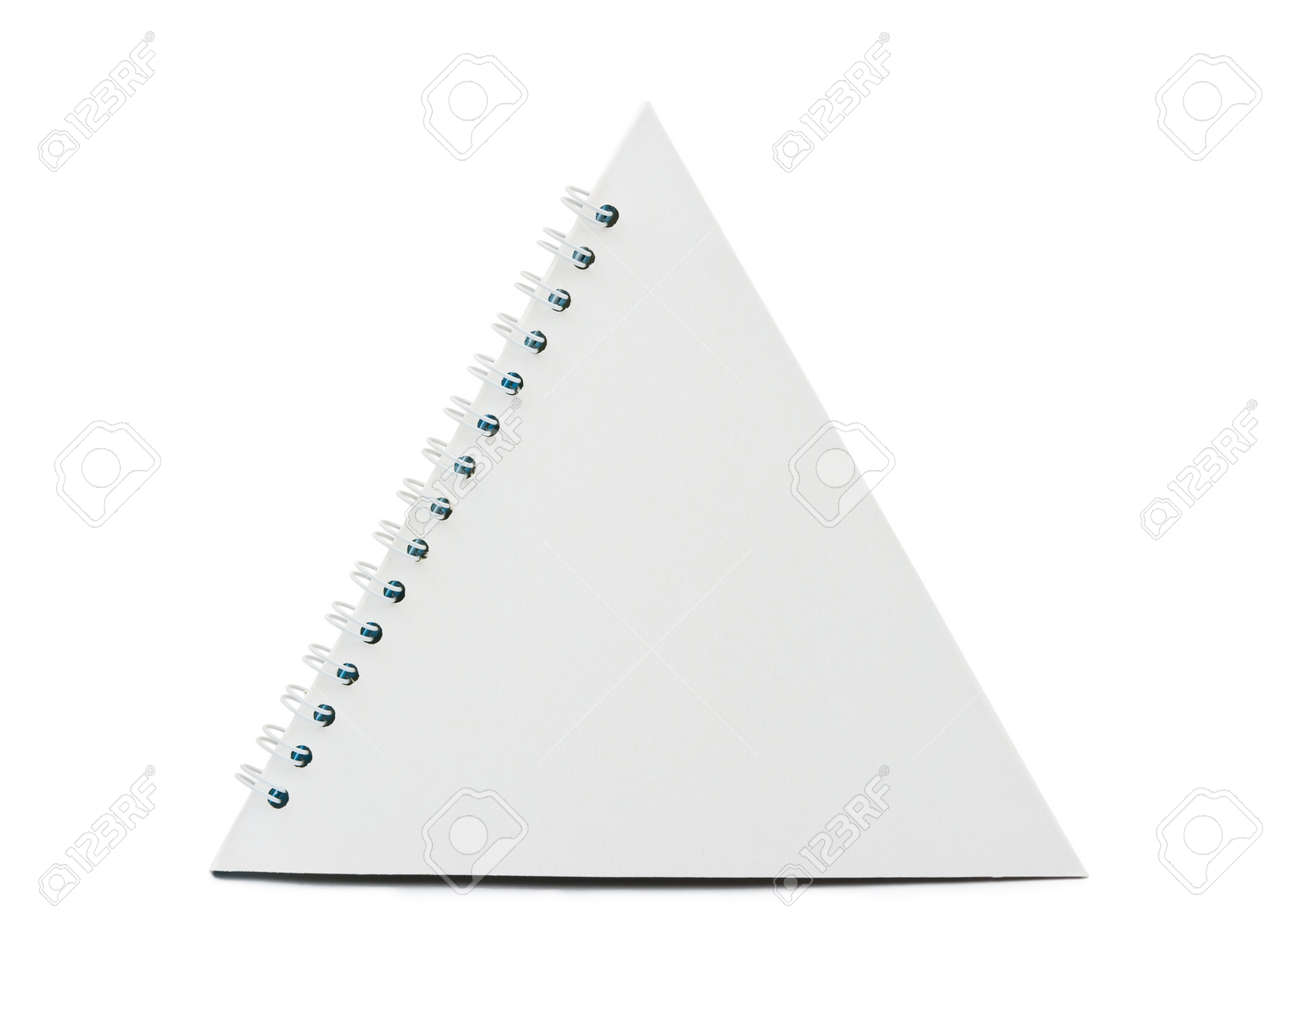 Blank desktop calendar isolated on white background Stock Photo - 13702317